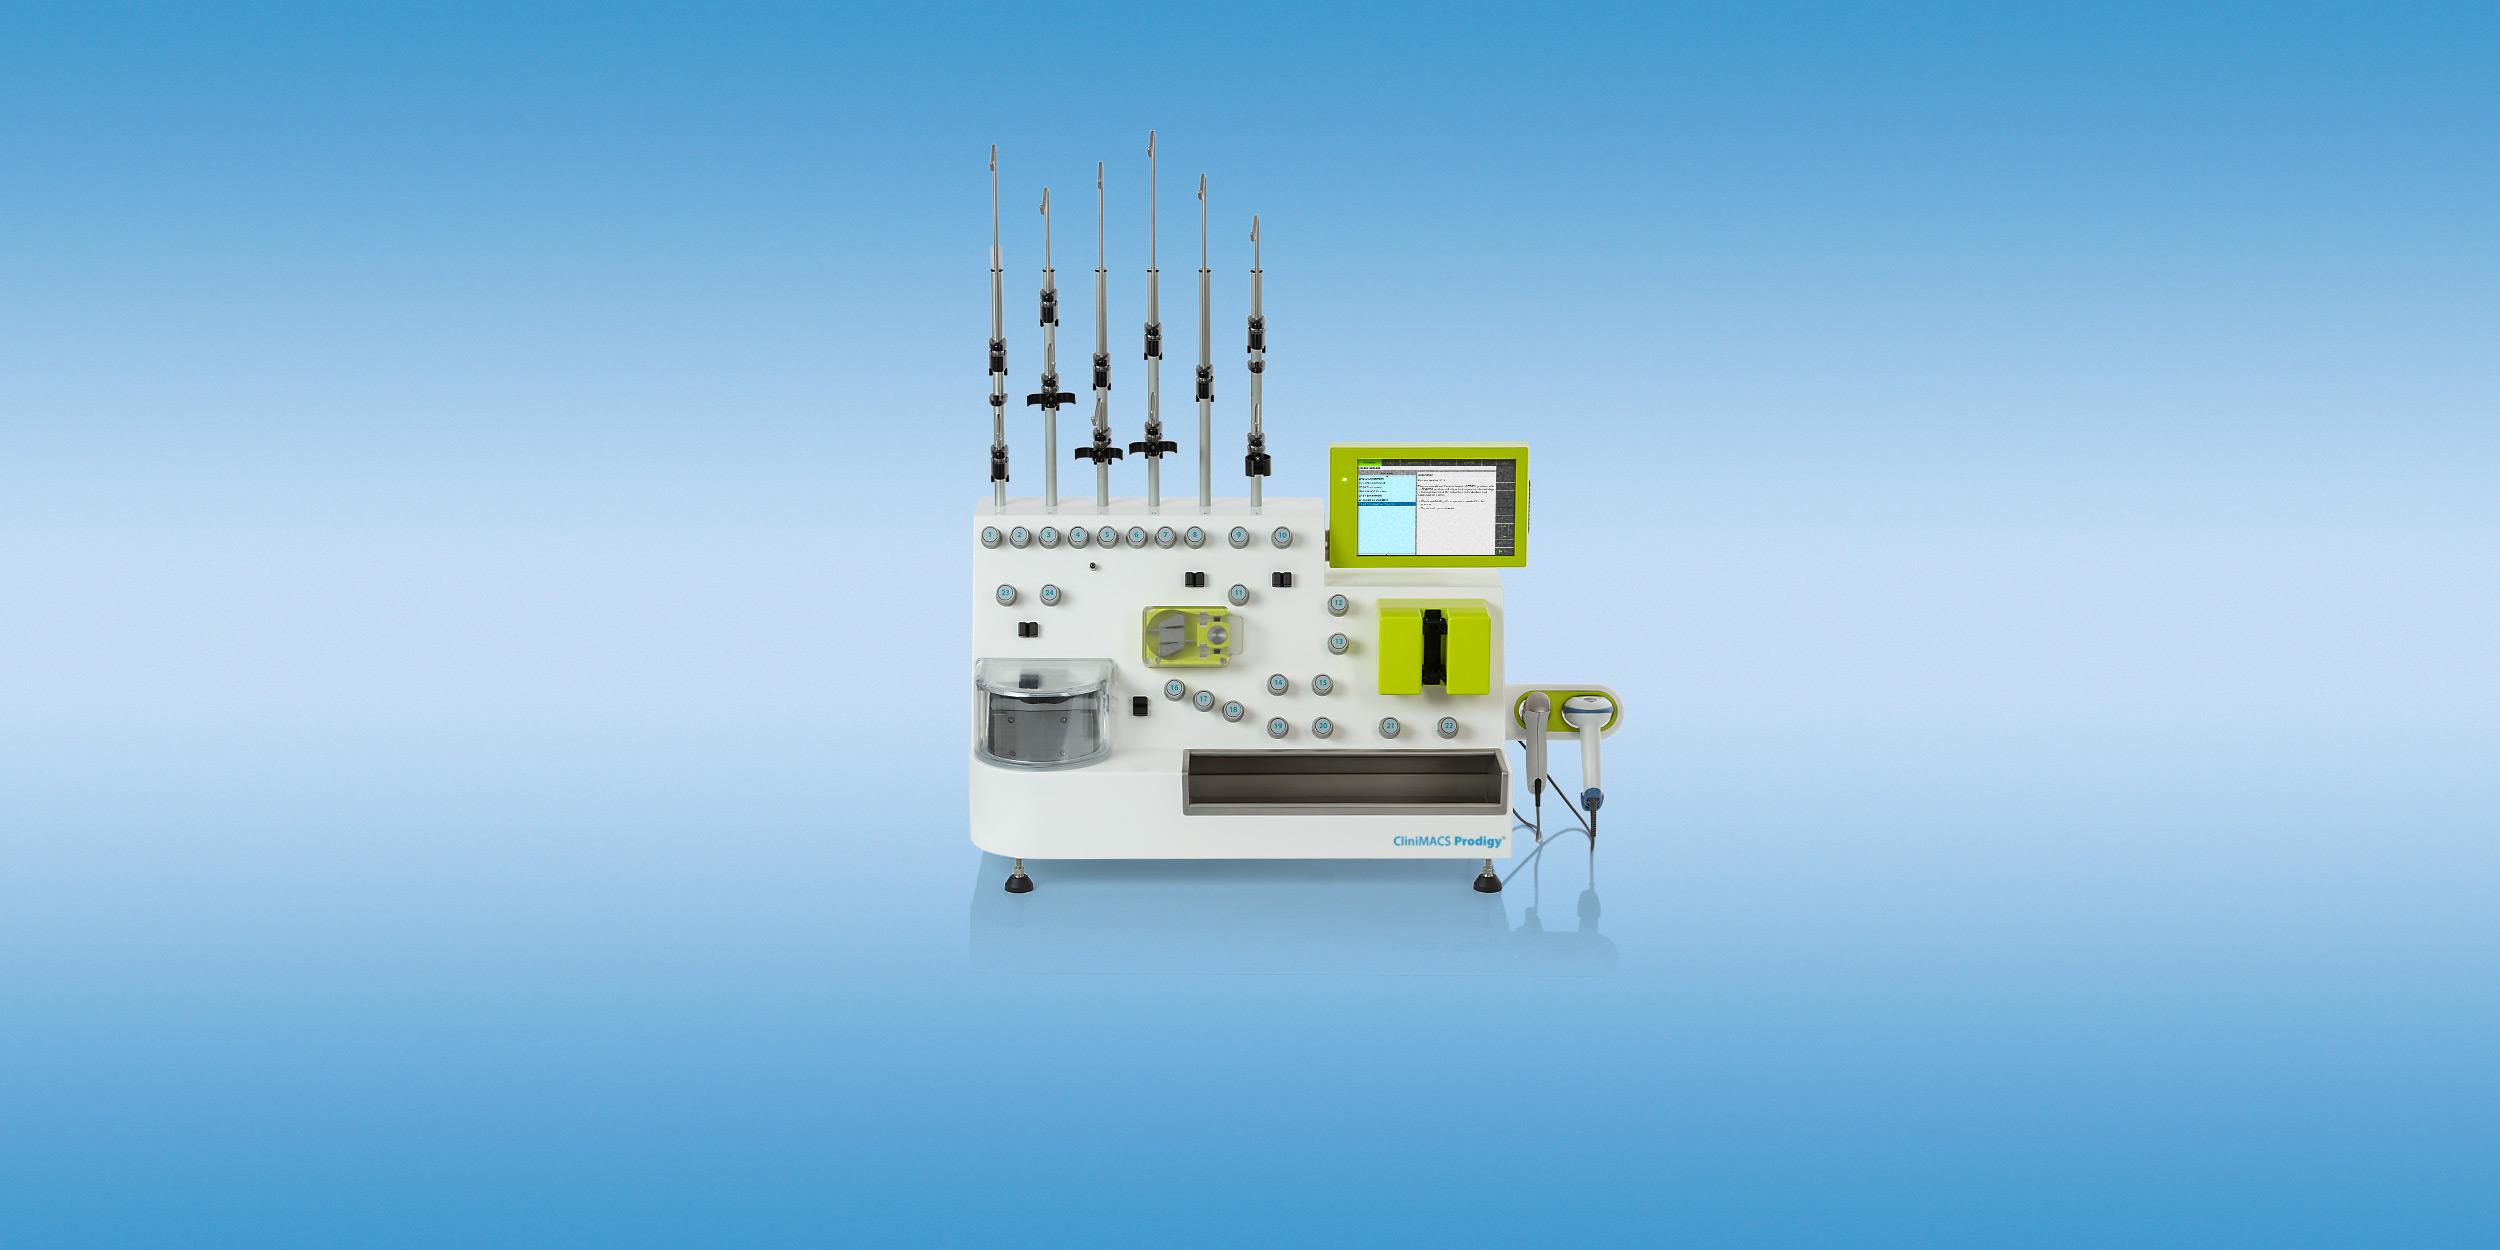 CliniMACS Prodigy Instrument